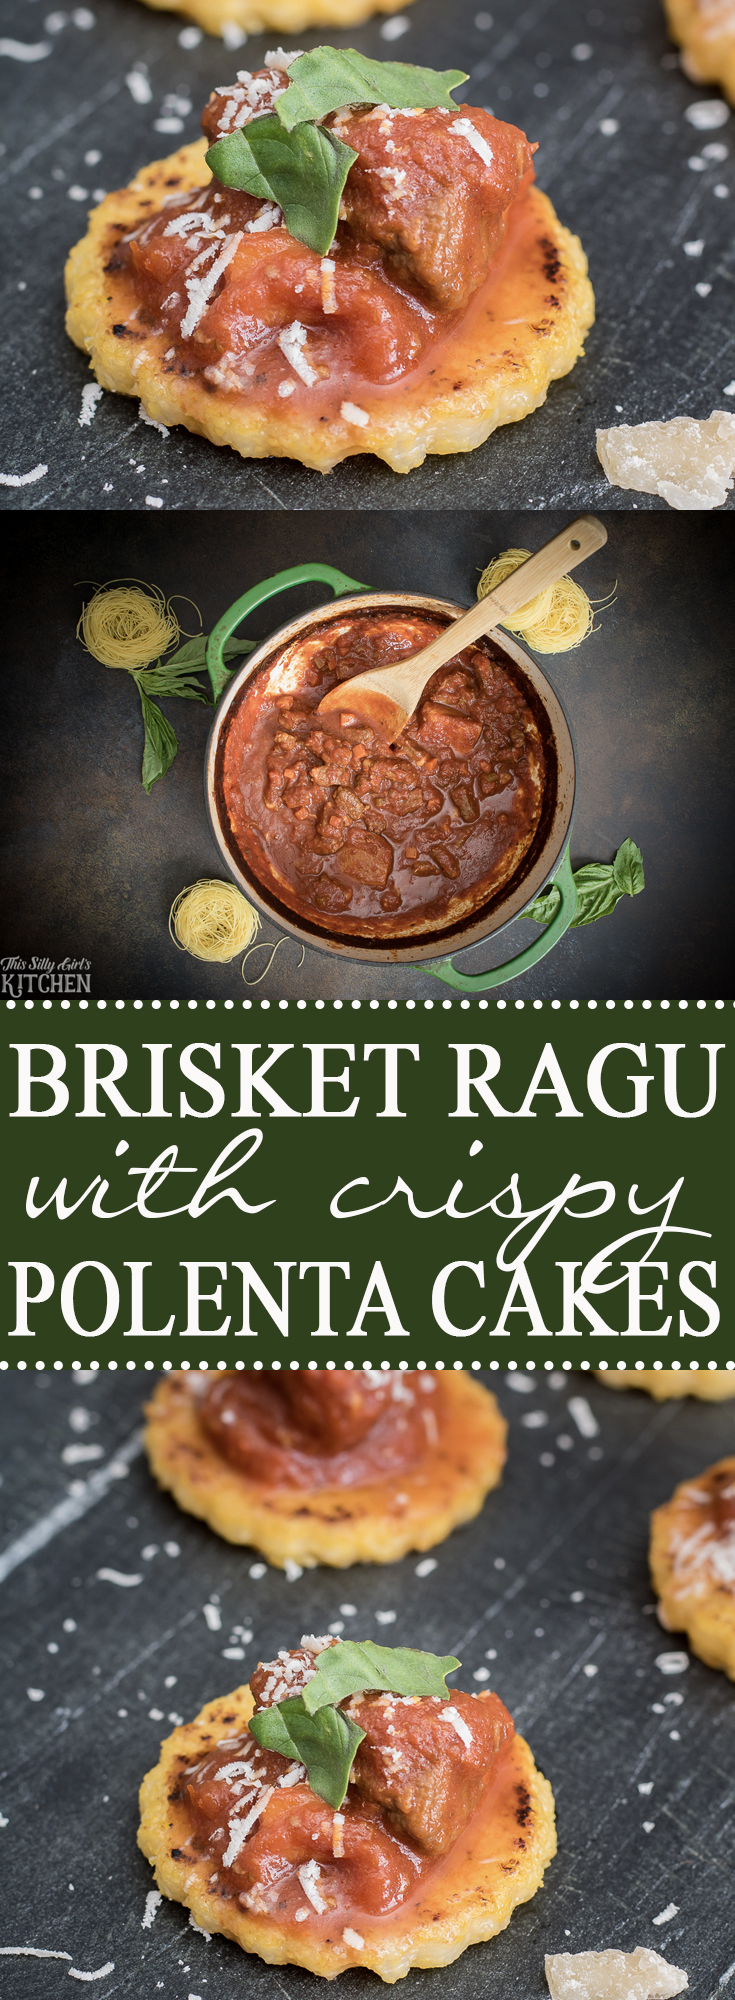 Brisket Ragu with Crispy Polenta Cakes is an elegant appetizer to serve at your next party! Recipe from ThisSillyGirlsKitchen.com #BrisketRagu #Ragu #Recipe #Polenta